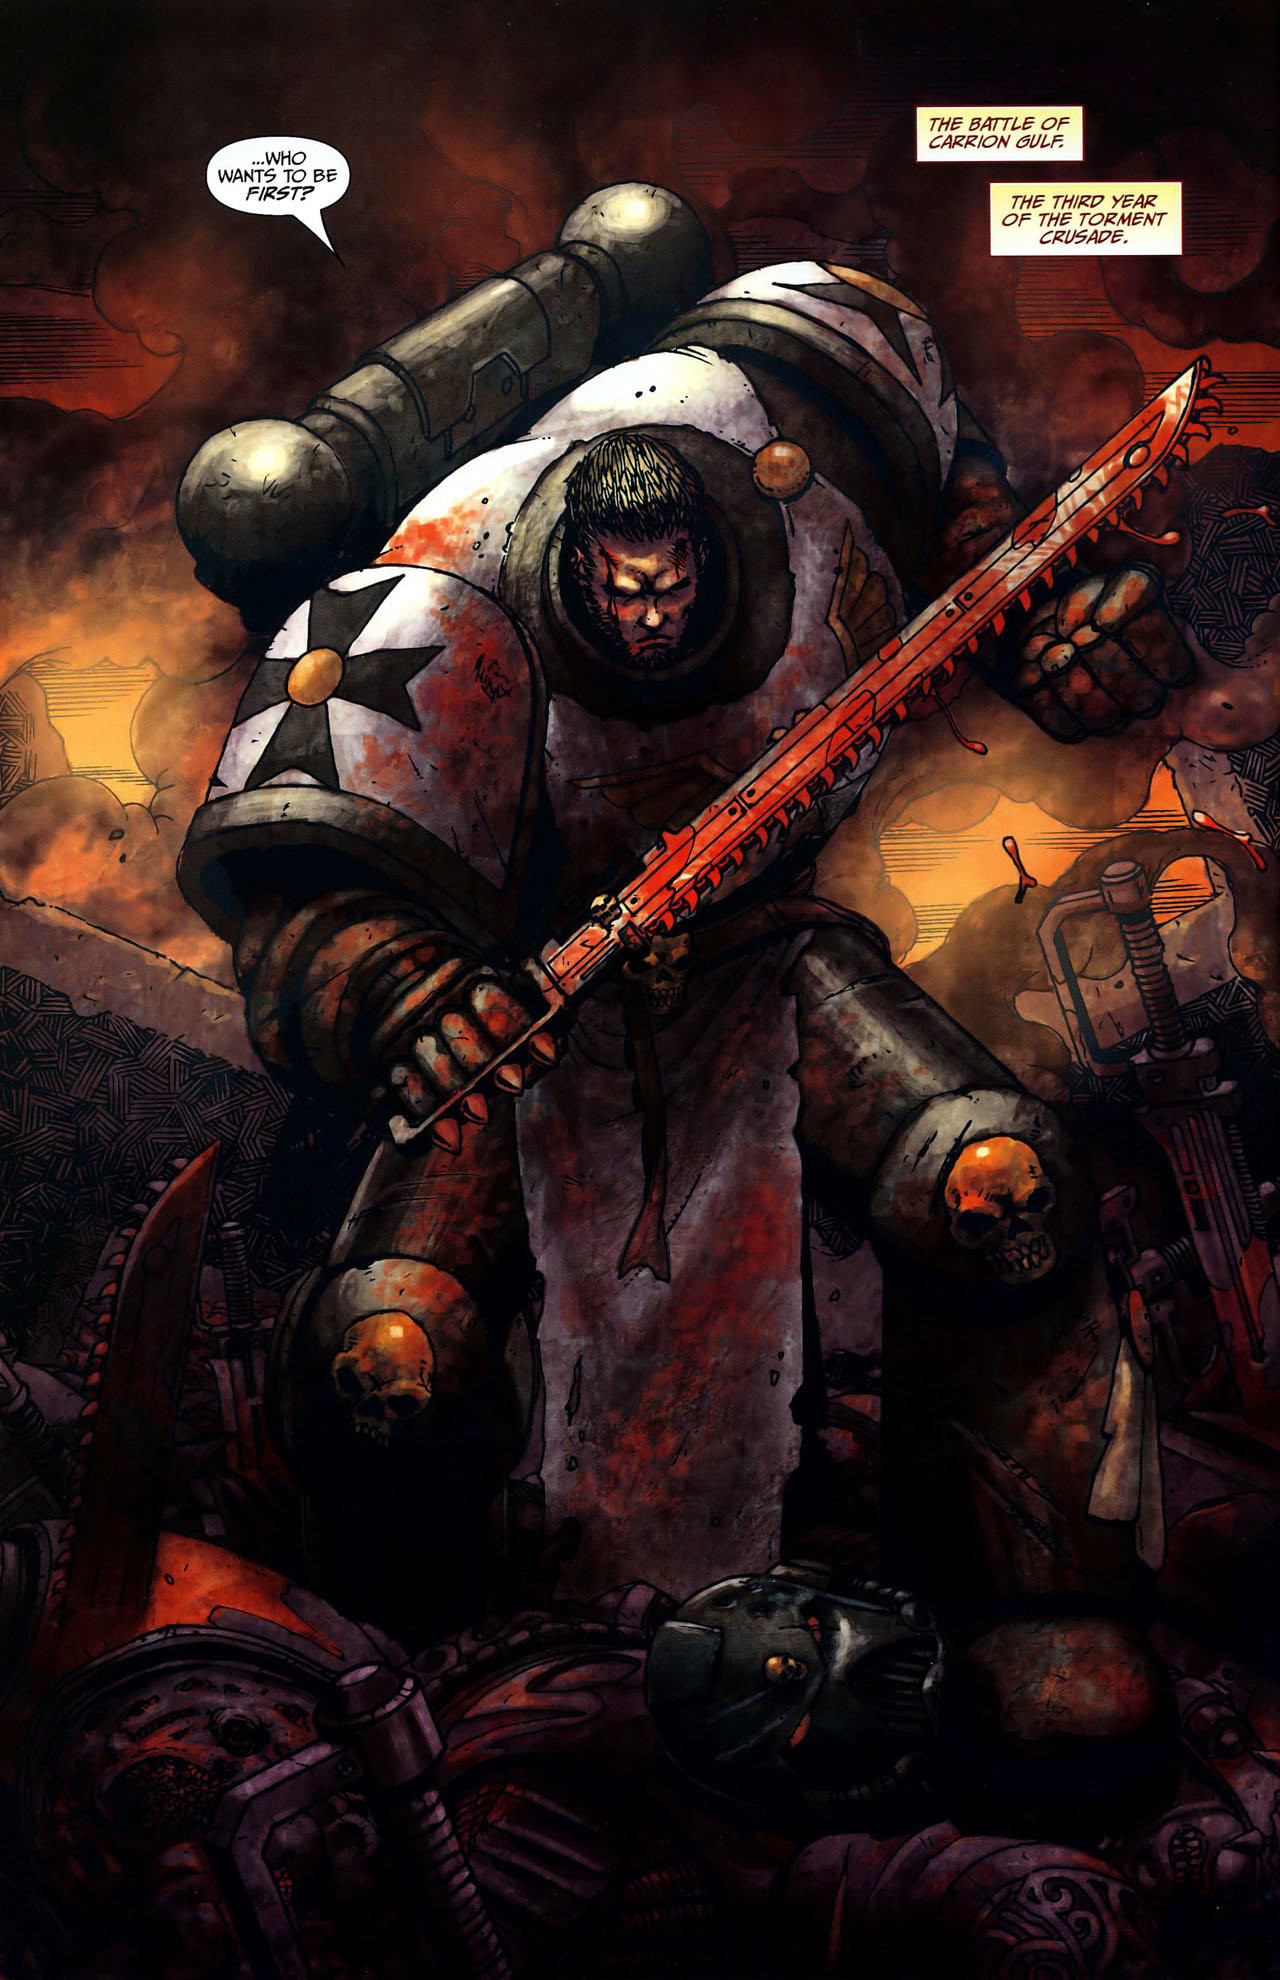 Warhammer 40k death company wallpaper - 1920x1080 Death Company Epic Music Tribute Warhammer Wikihammer 40k Blood Angels Wmv Youtube